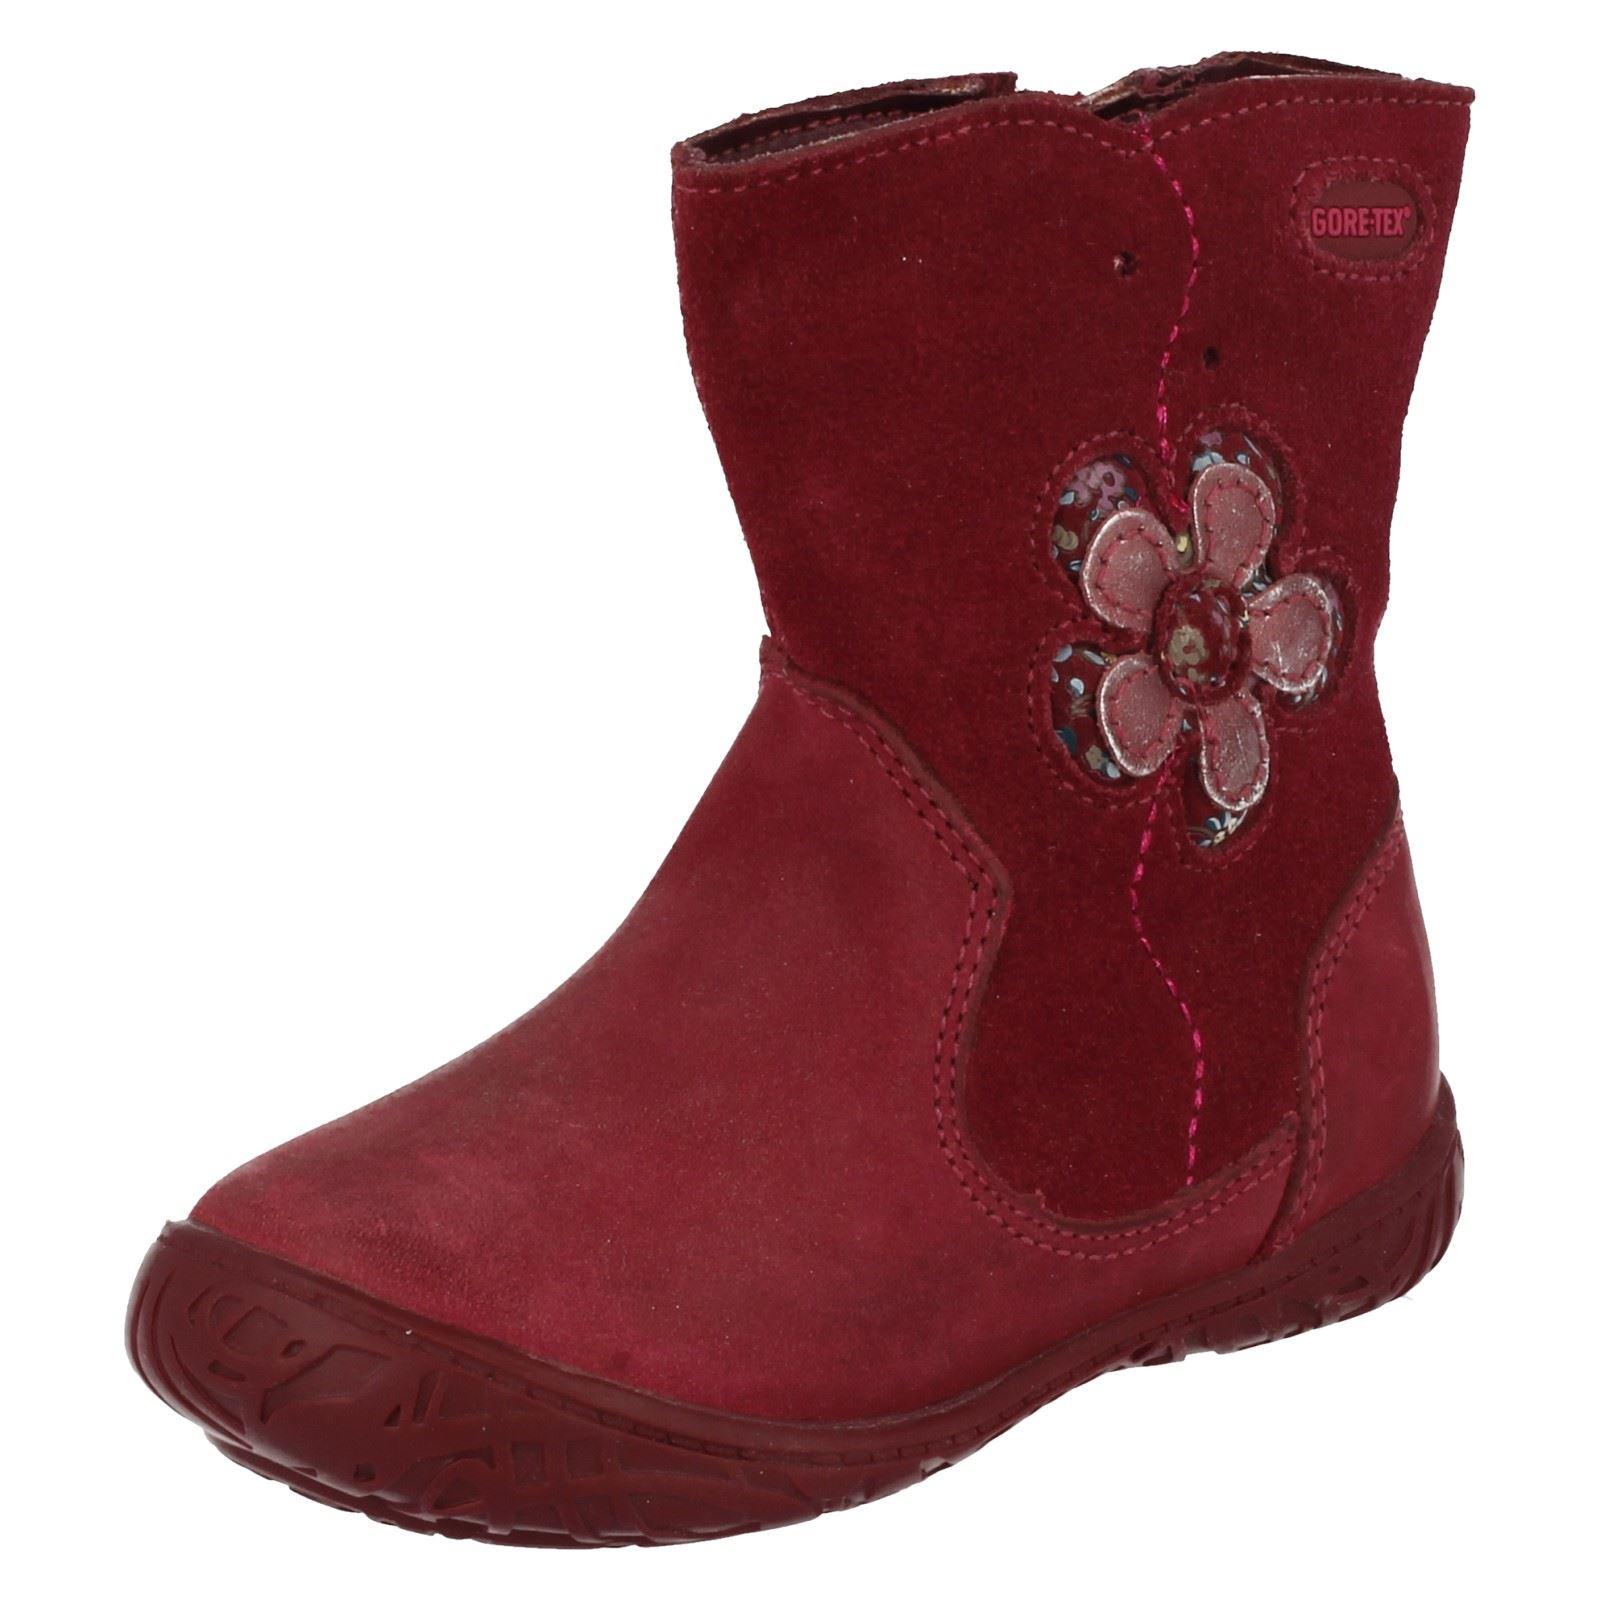 de rojo para niña Berry Hoola So Gtx flores Clarks Botas 5qHPSS